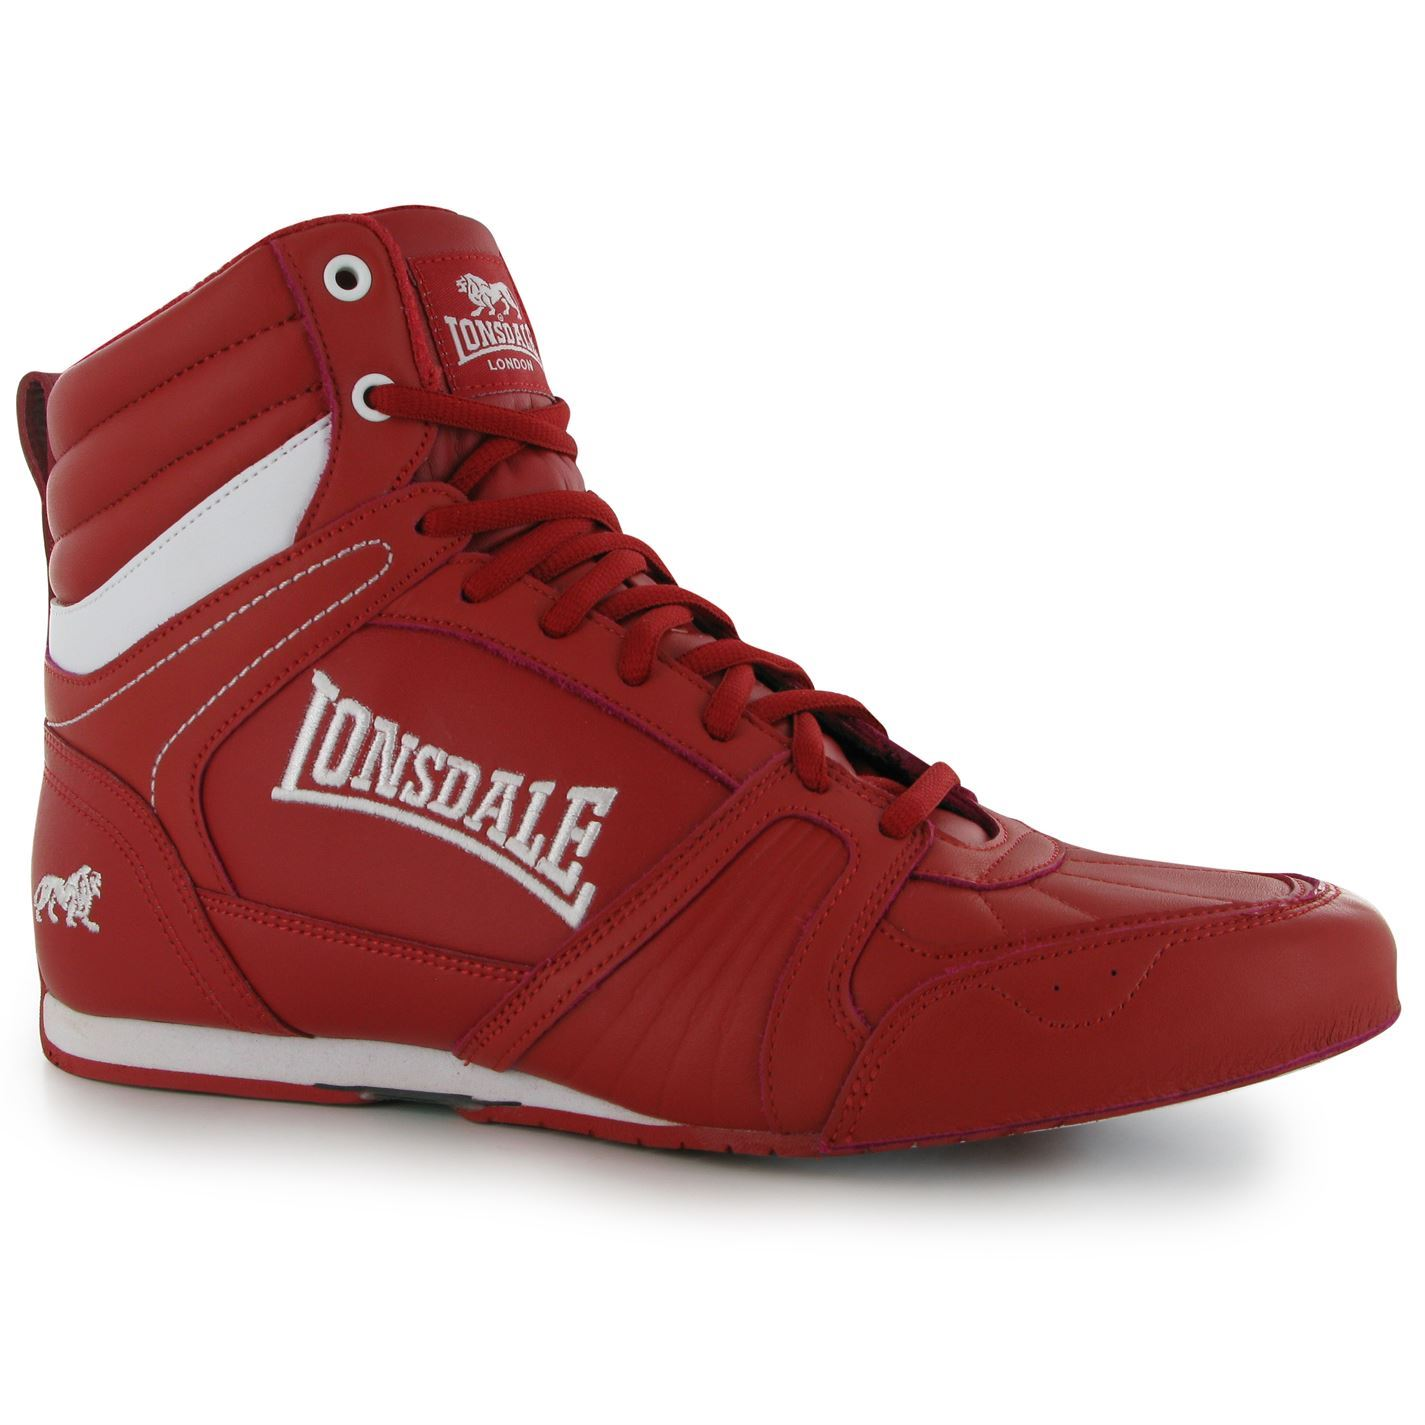 Lonsdale Shoes Uk